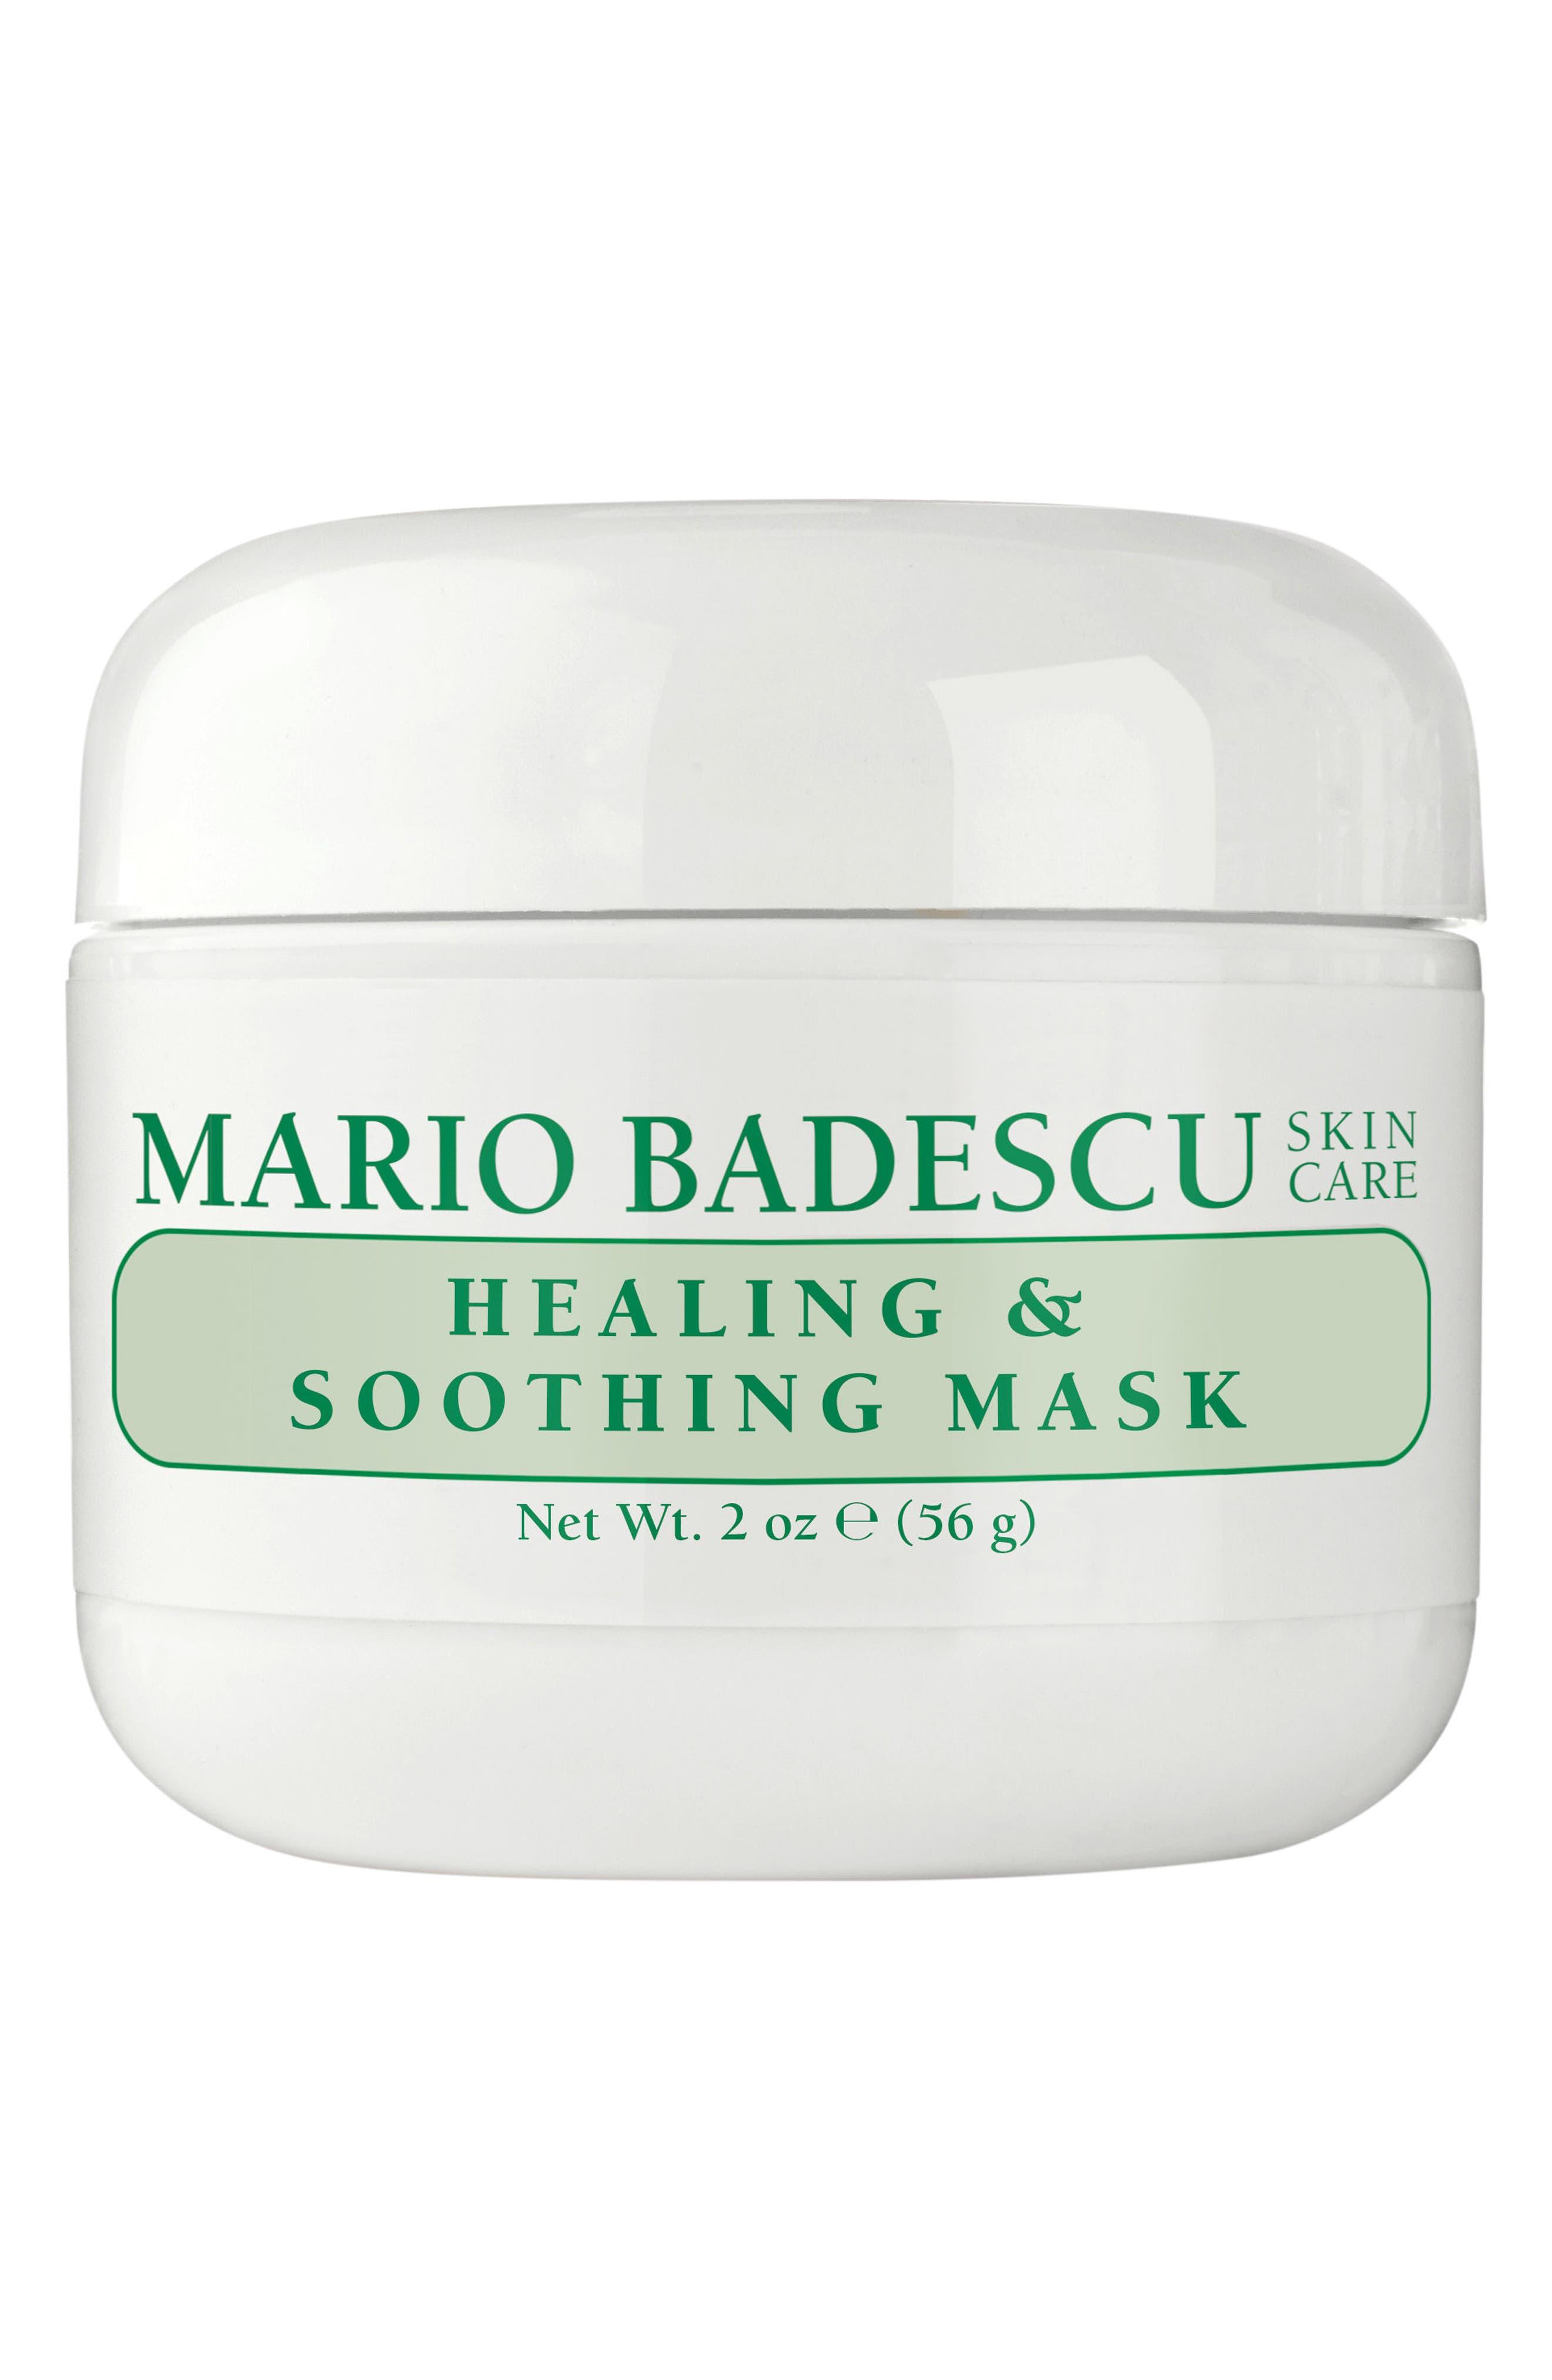 MARIO BADESCU Healing & Soothing Mask, Main, color, NO COLOR